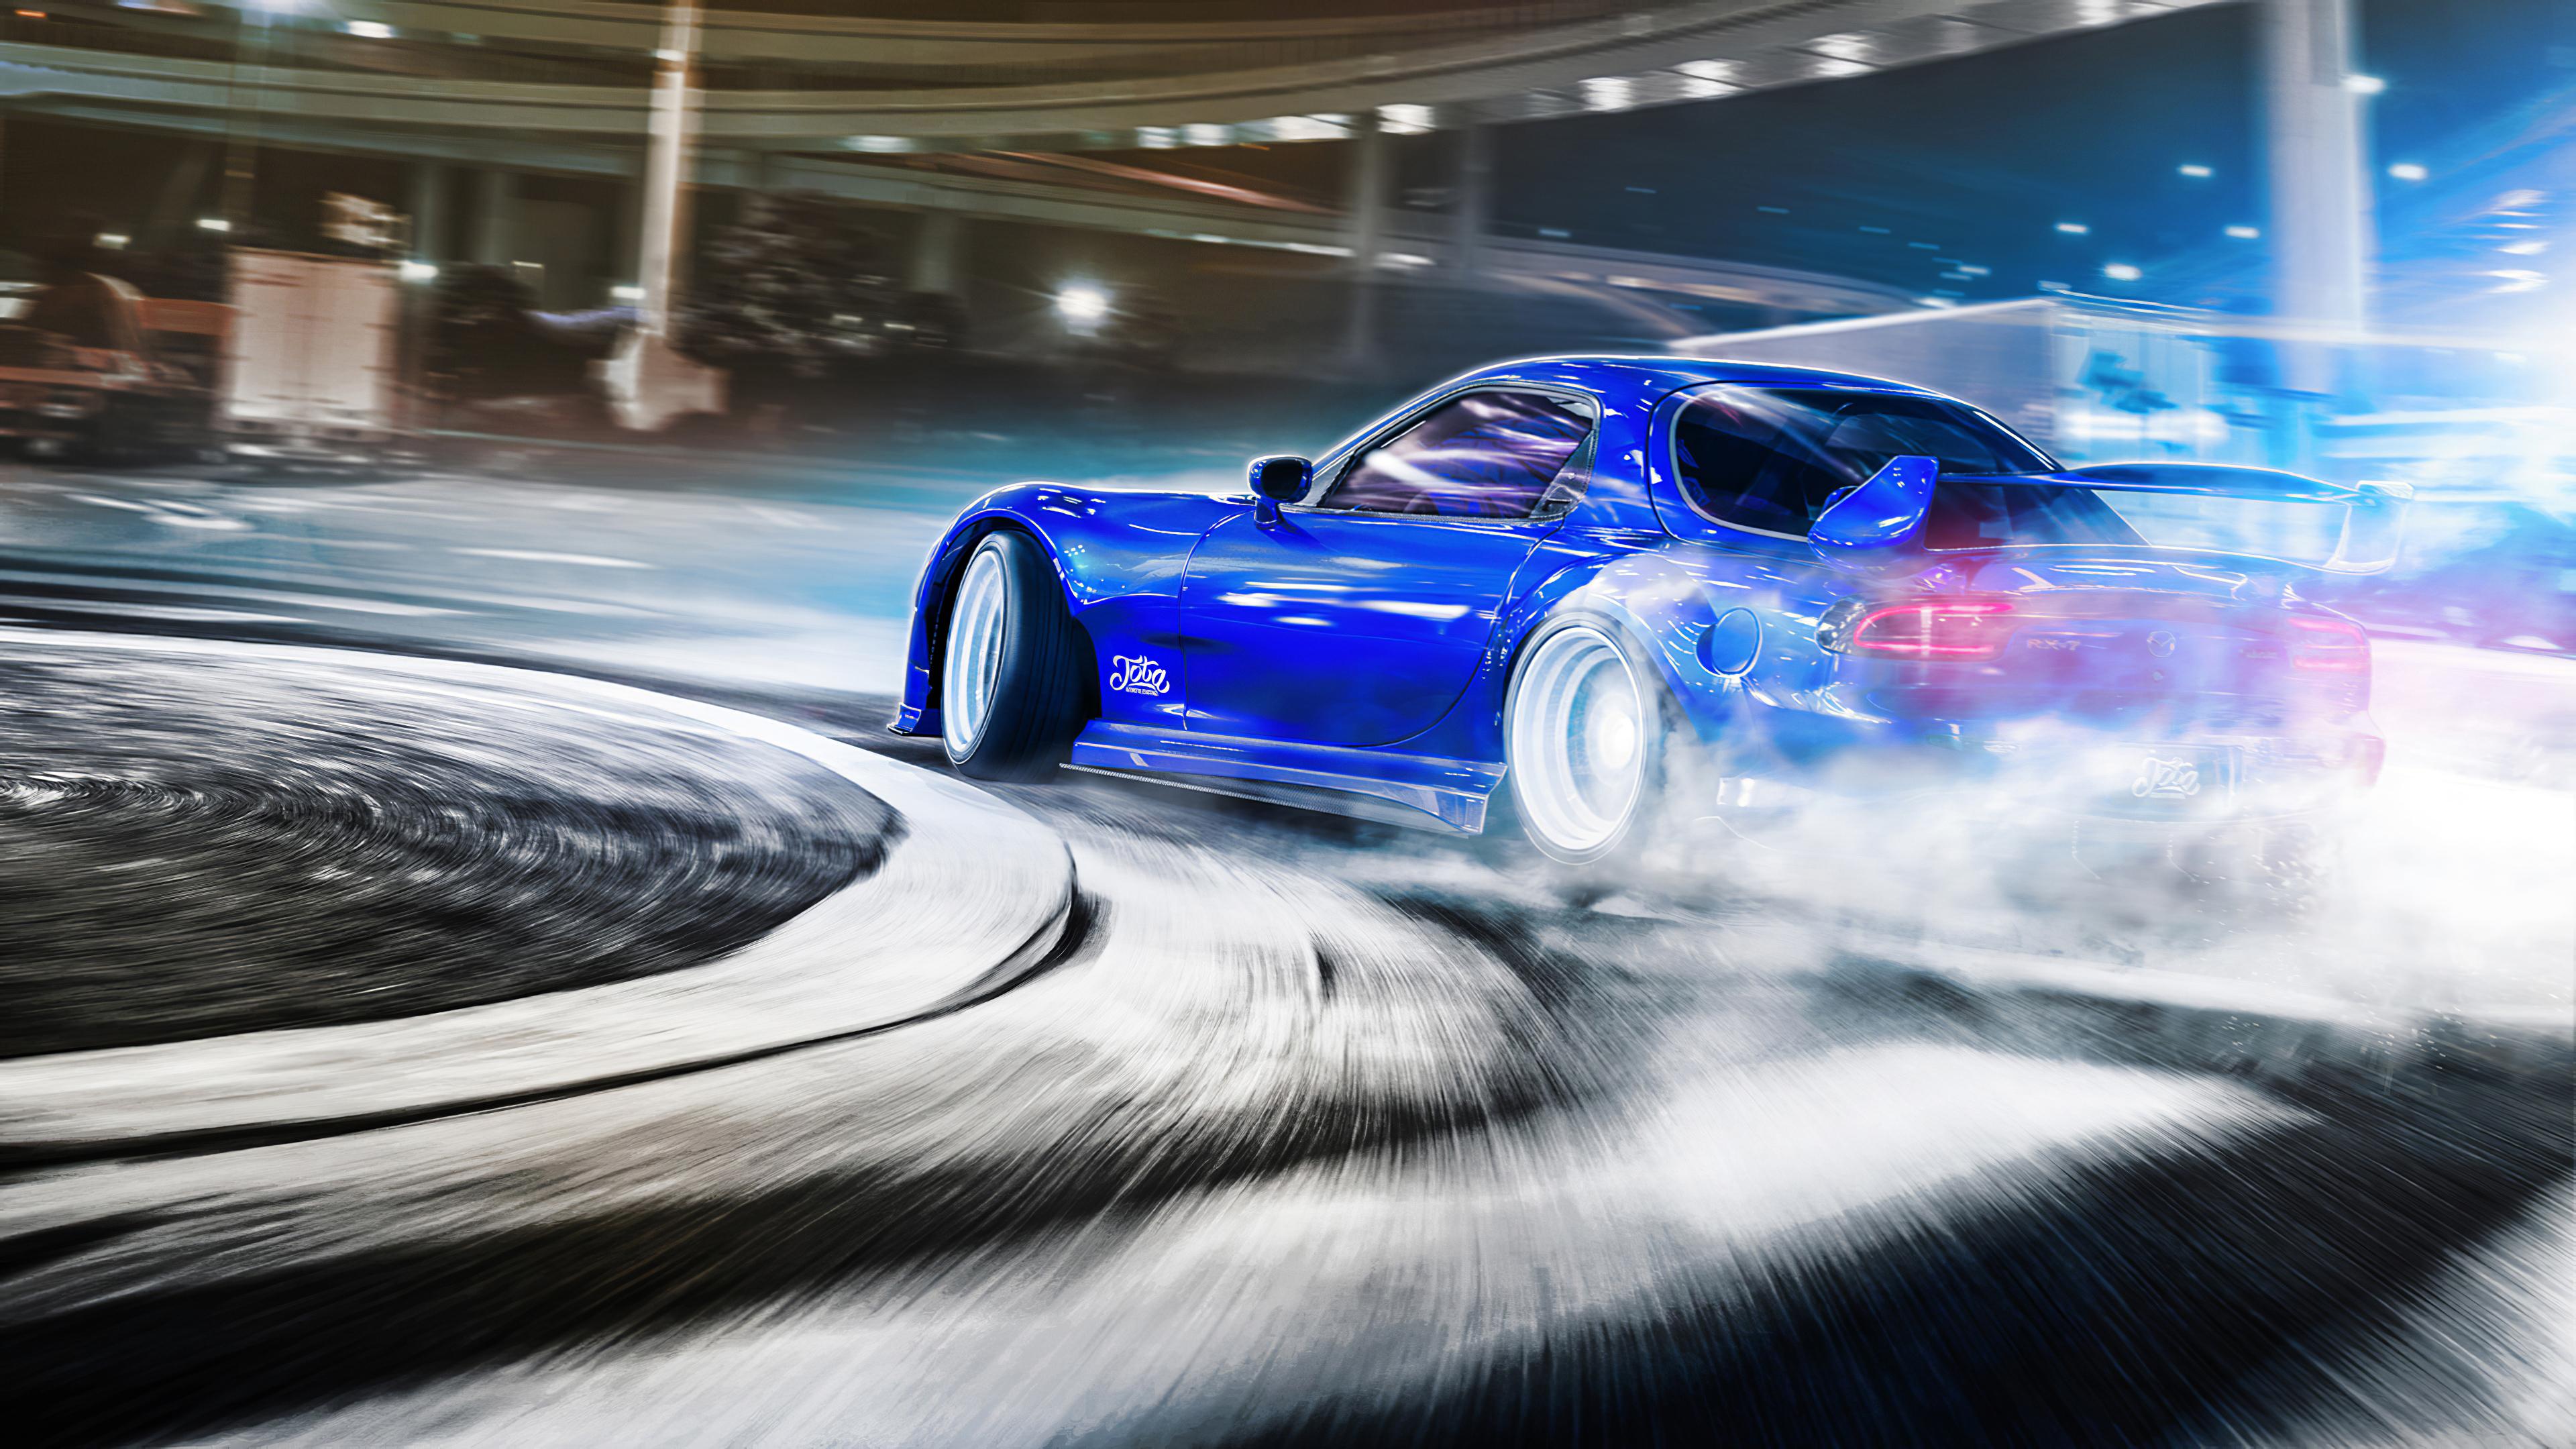 Mazda Rx7 Drifting 4k, HD Cars, 4k Wallpapers, Images ...